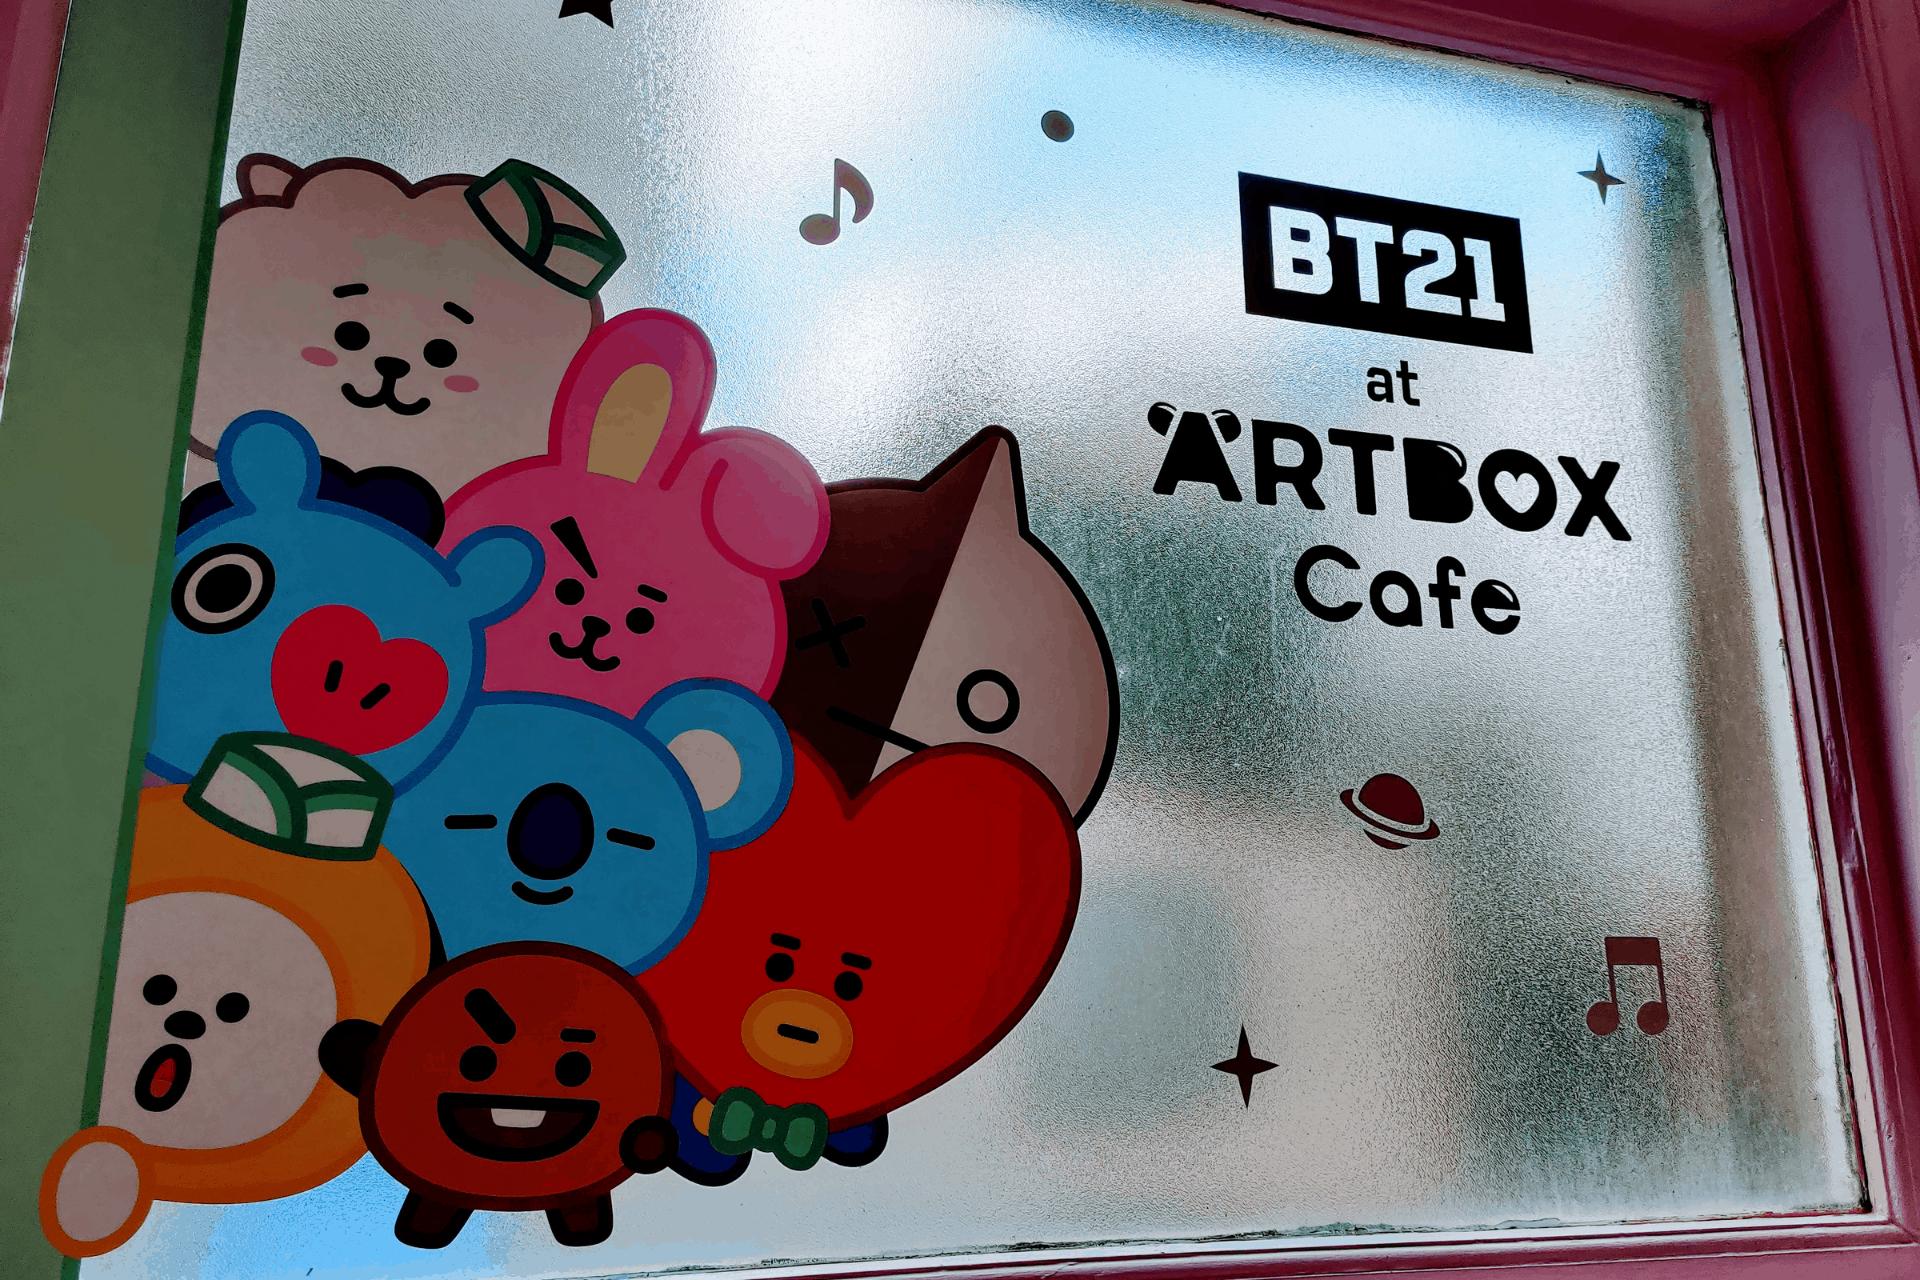 B21 at Artbox Cafe in Brighton